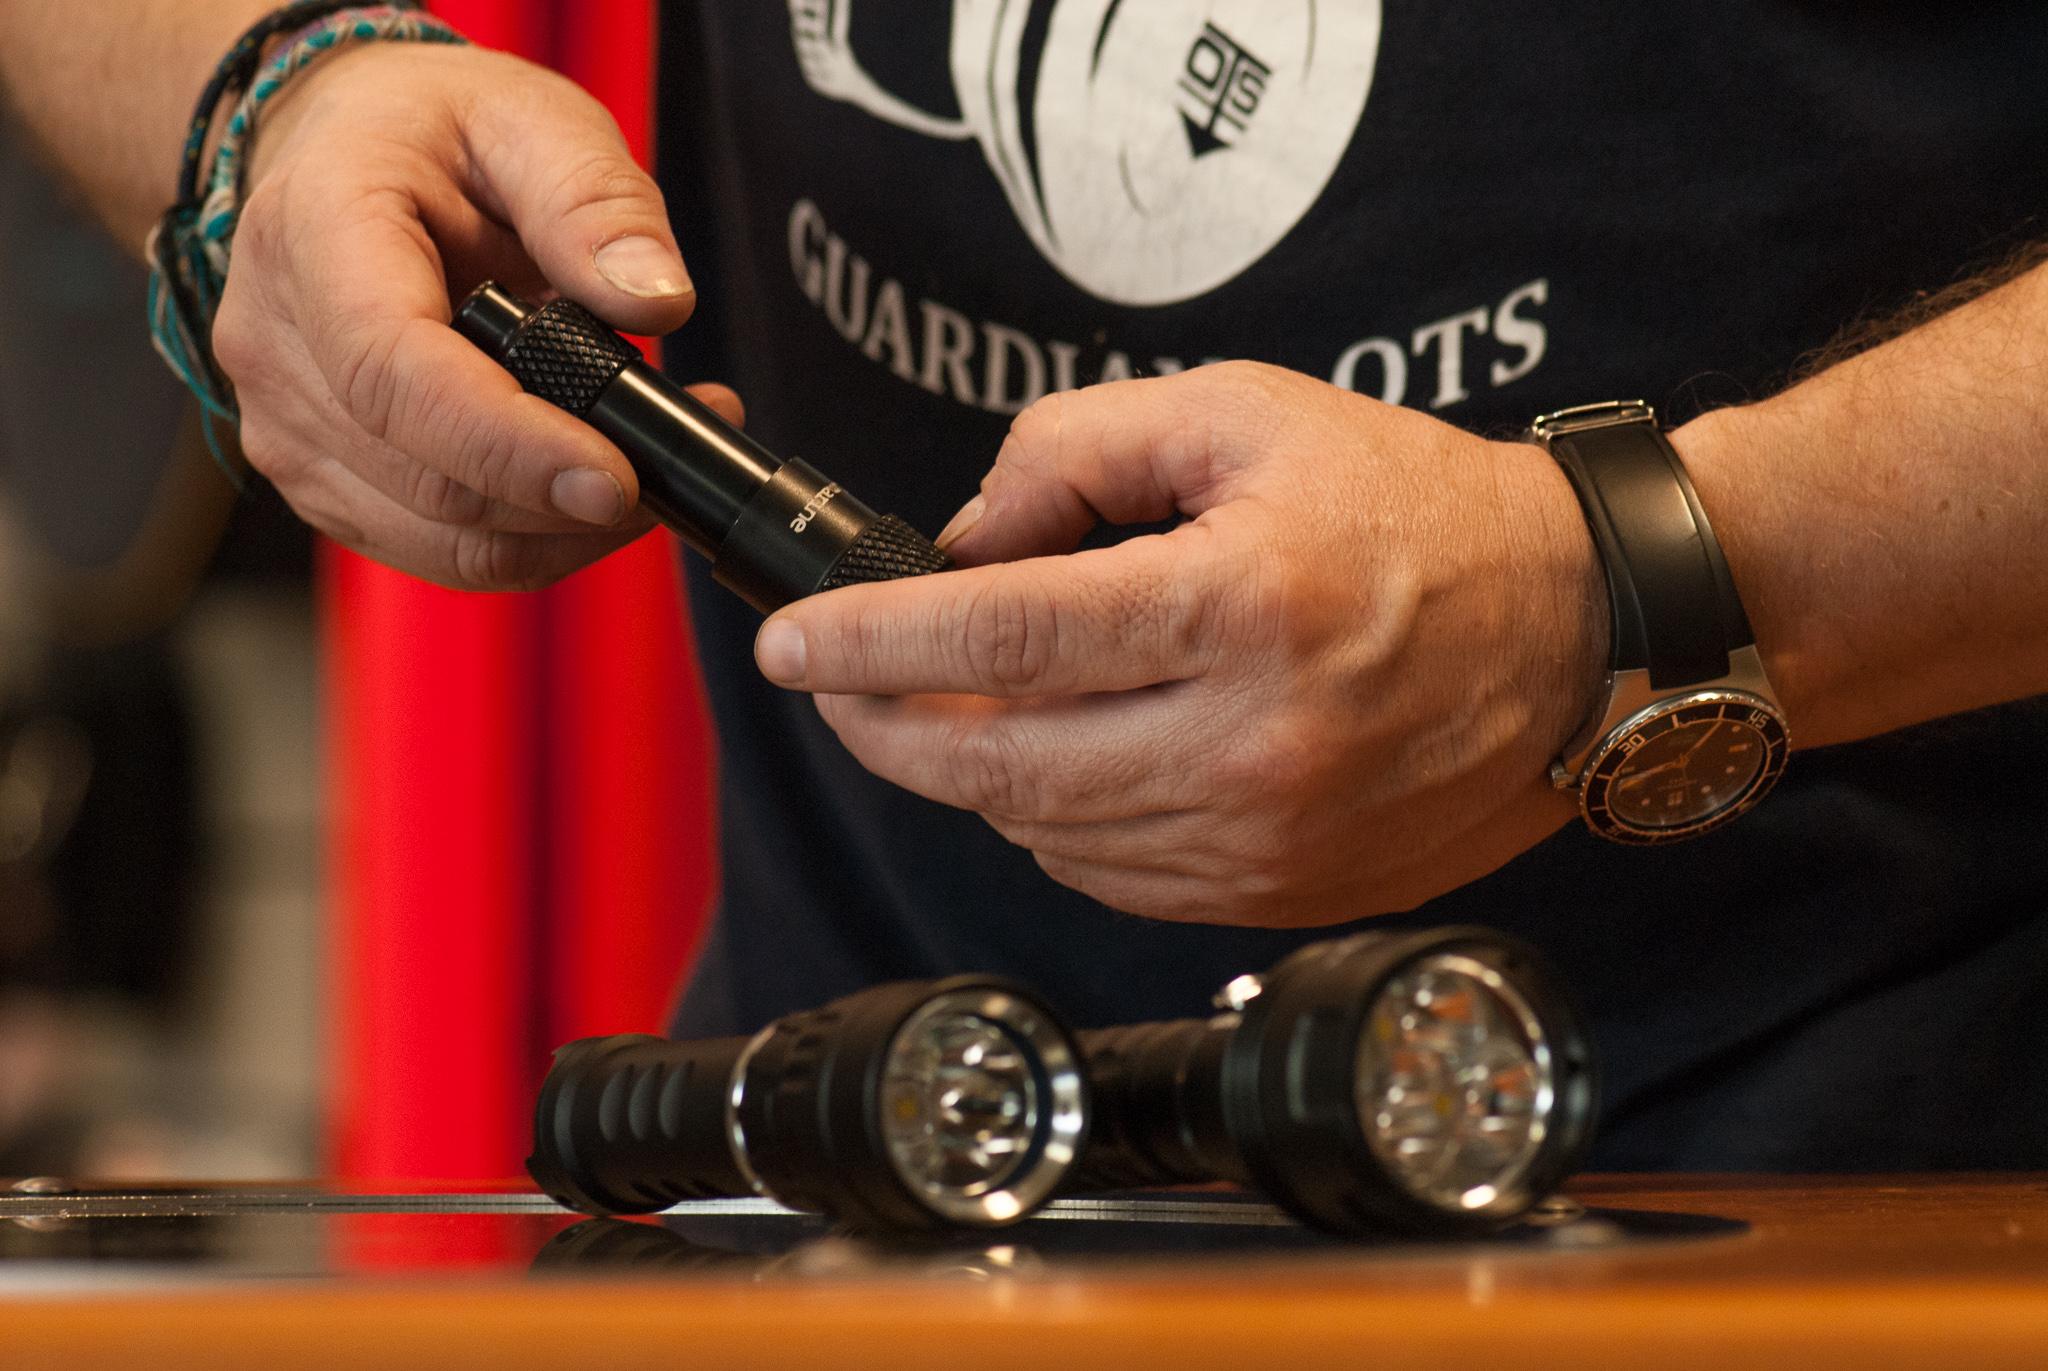 Akcesoria nurkowe: nóż, bojka, kompas, latarka, tabliczka -